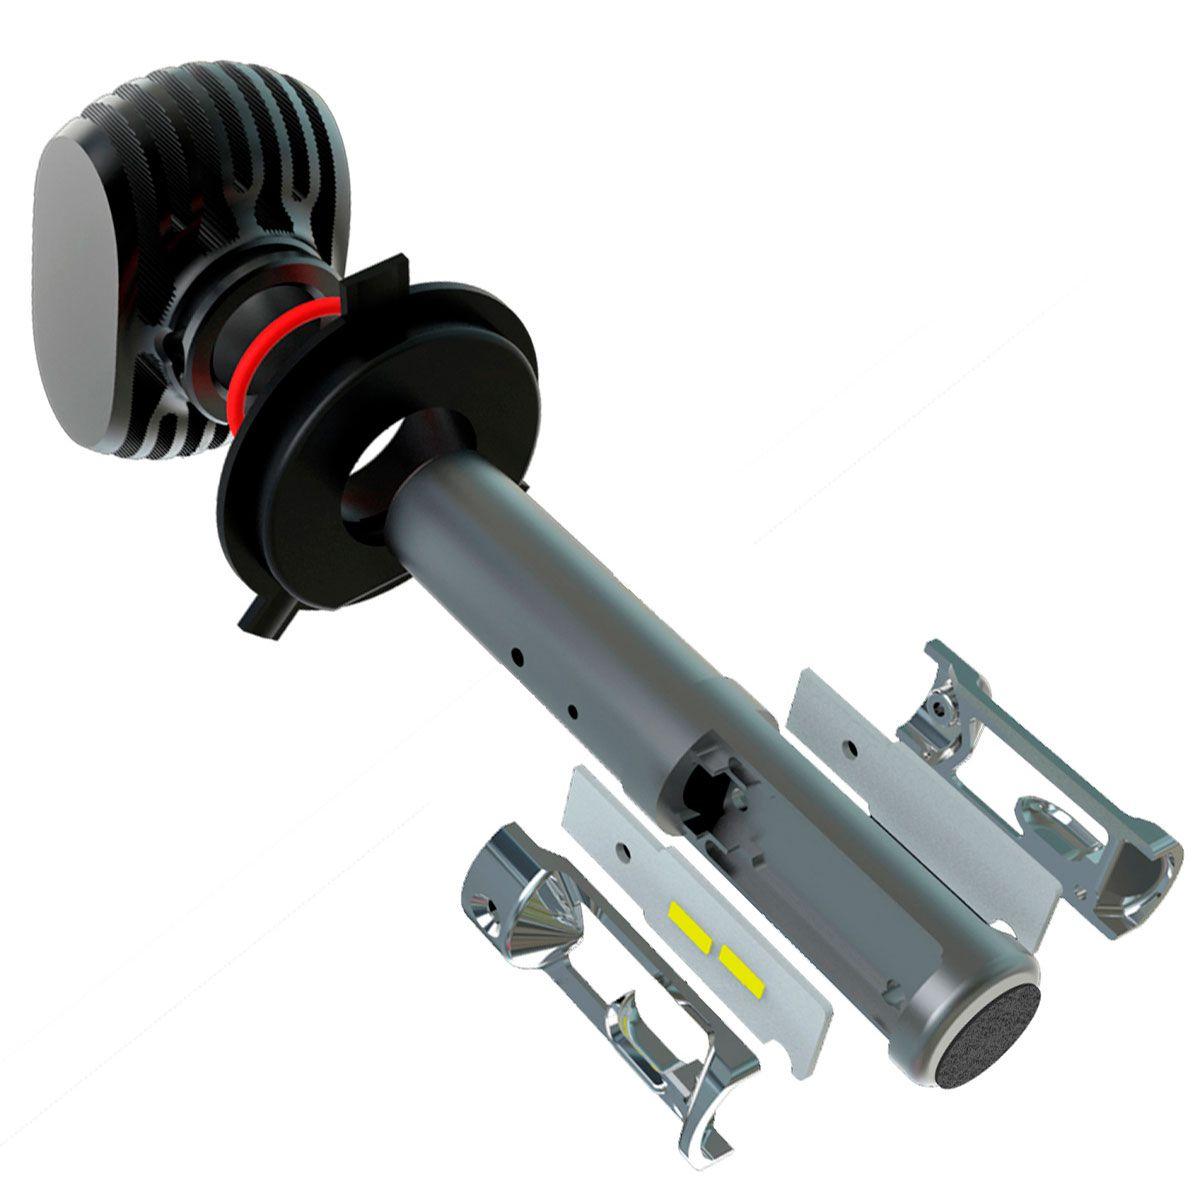 Kit Ultra LED Corolla 2012 2013 2014 tipo xenon farol milha H27 50W